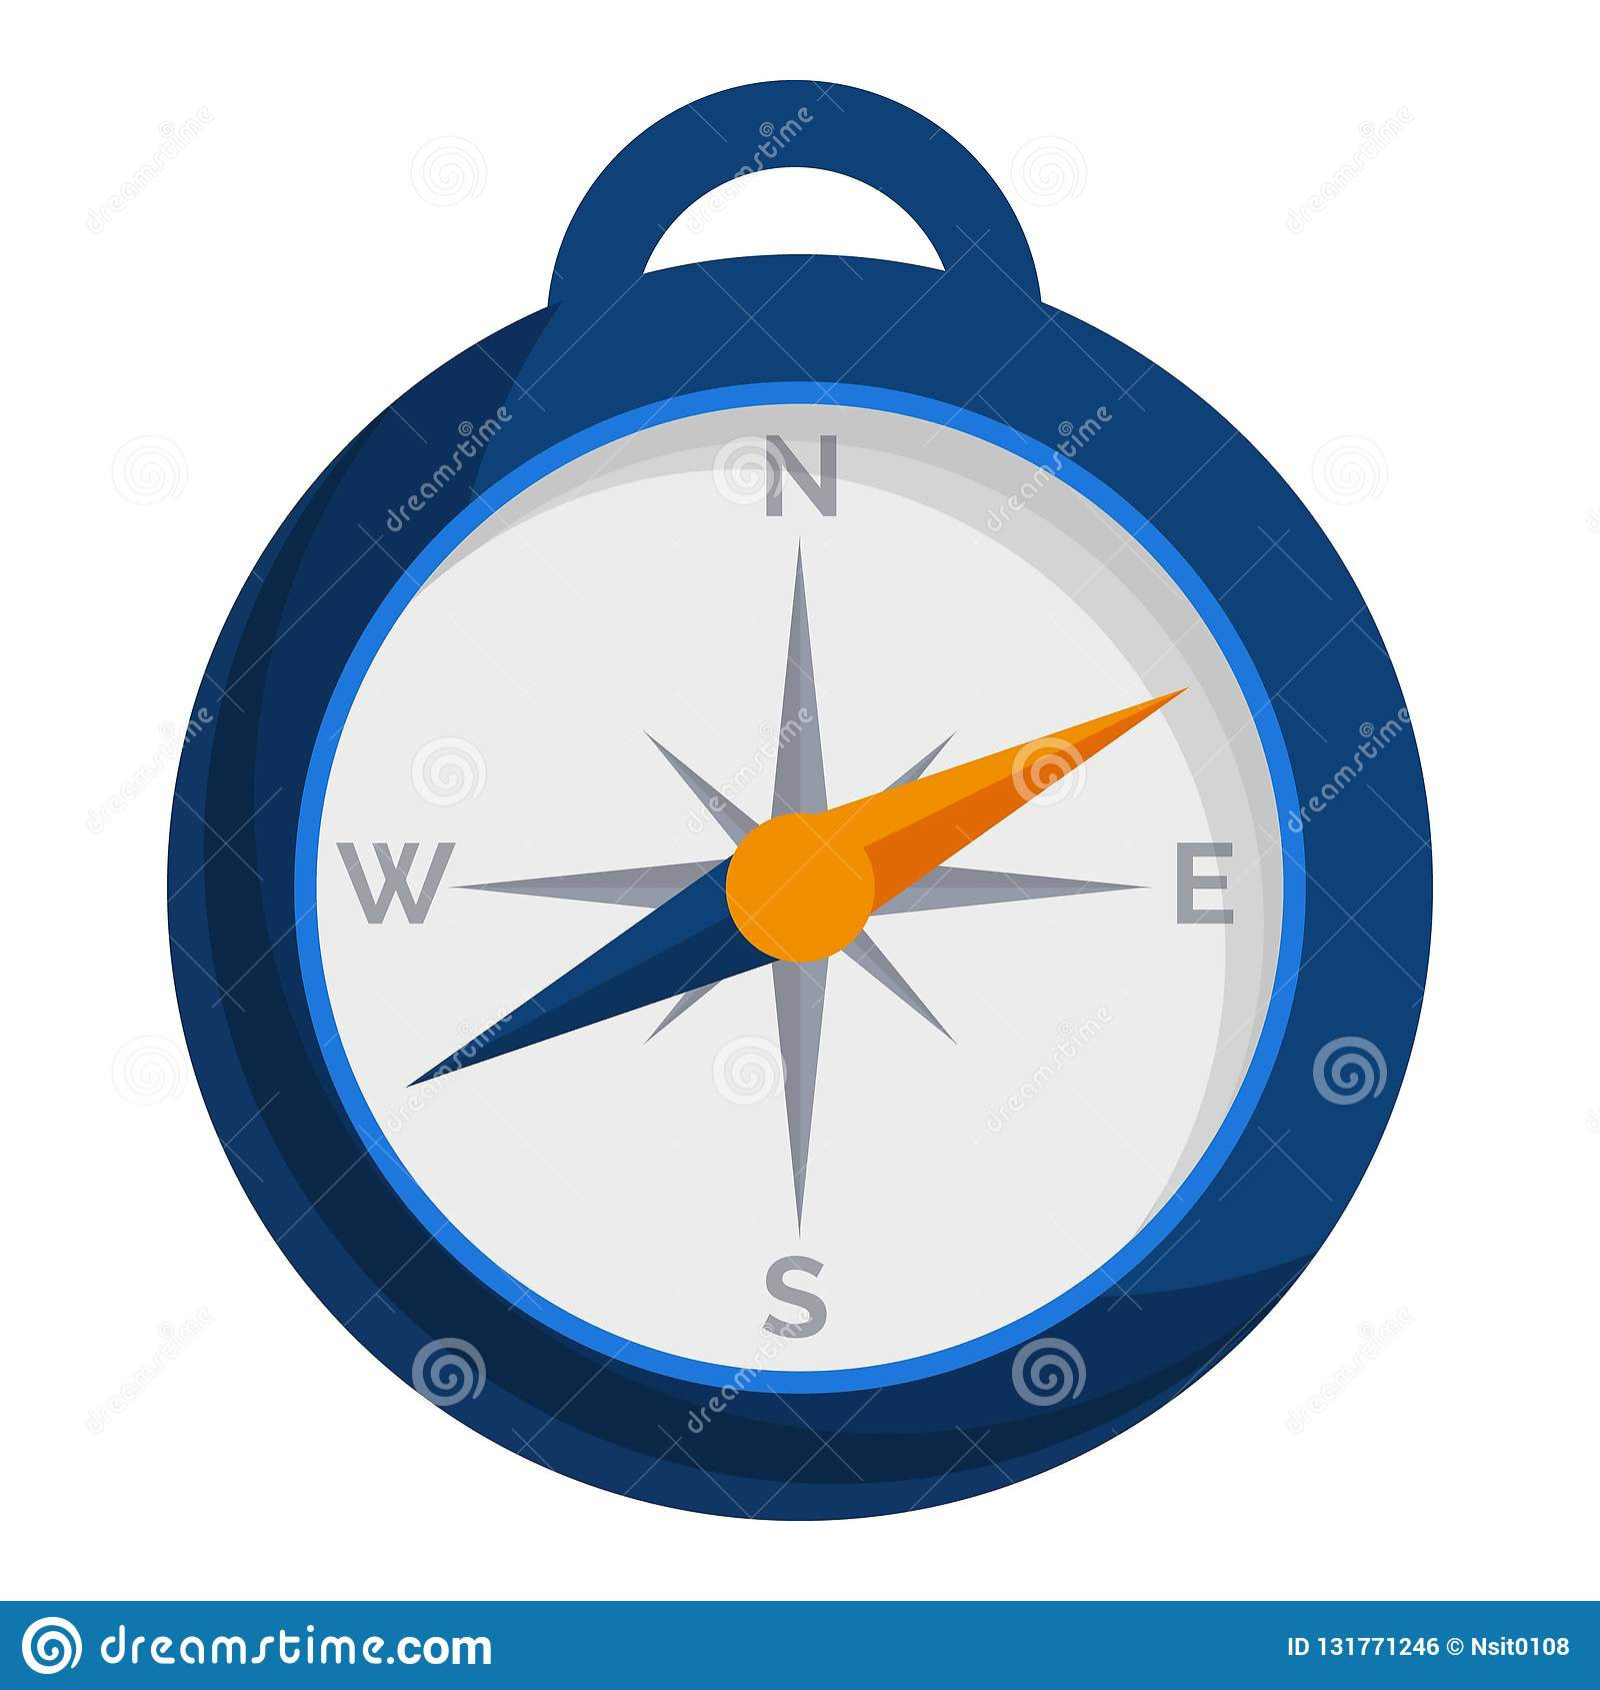 Camp compass icon, cartoon style